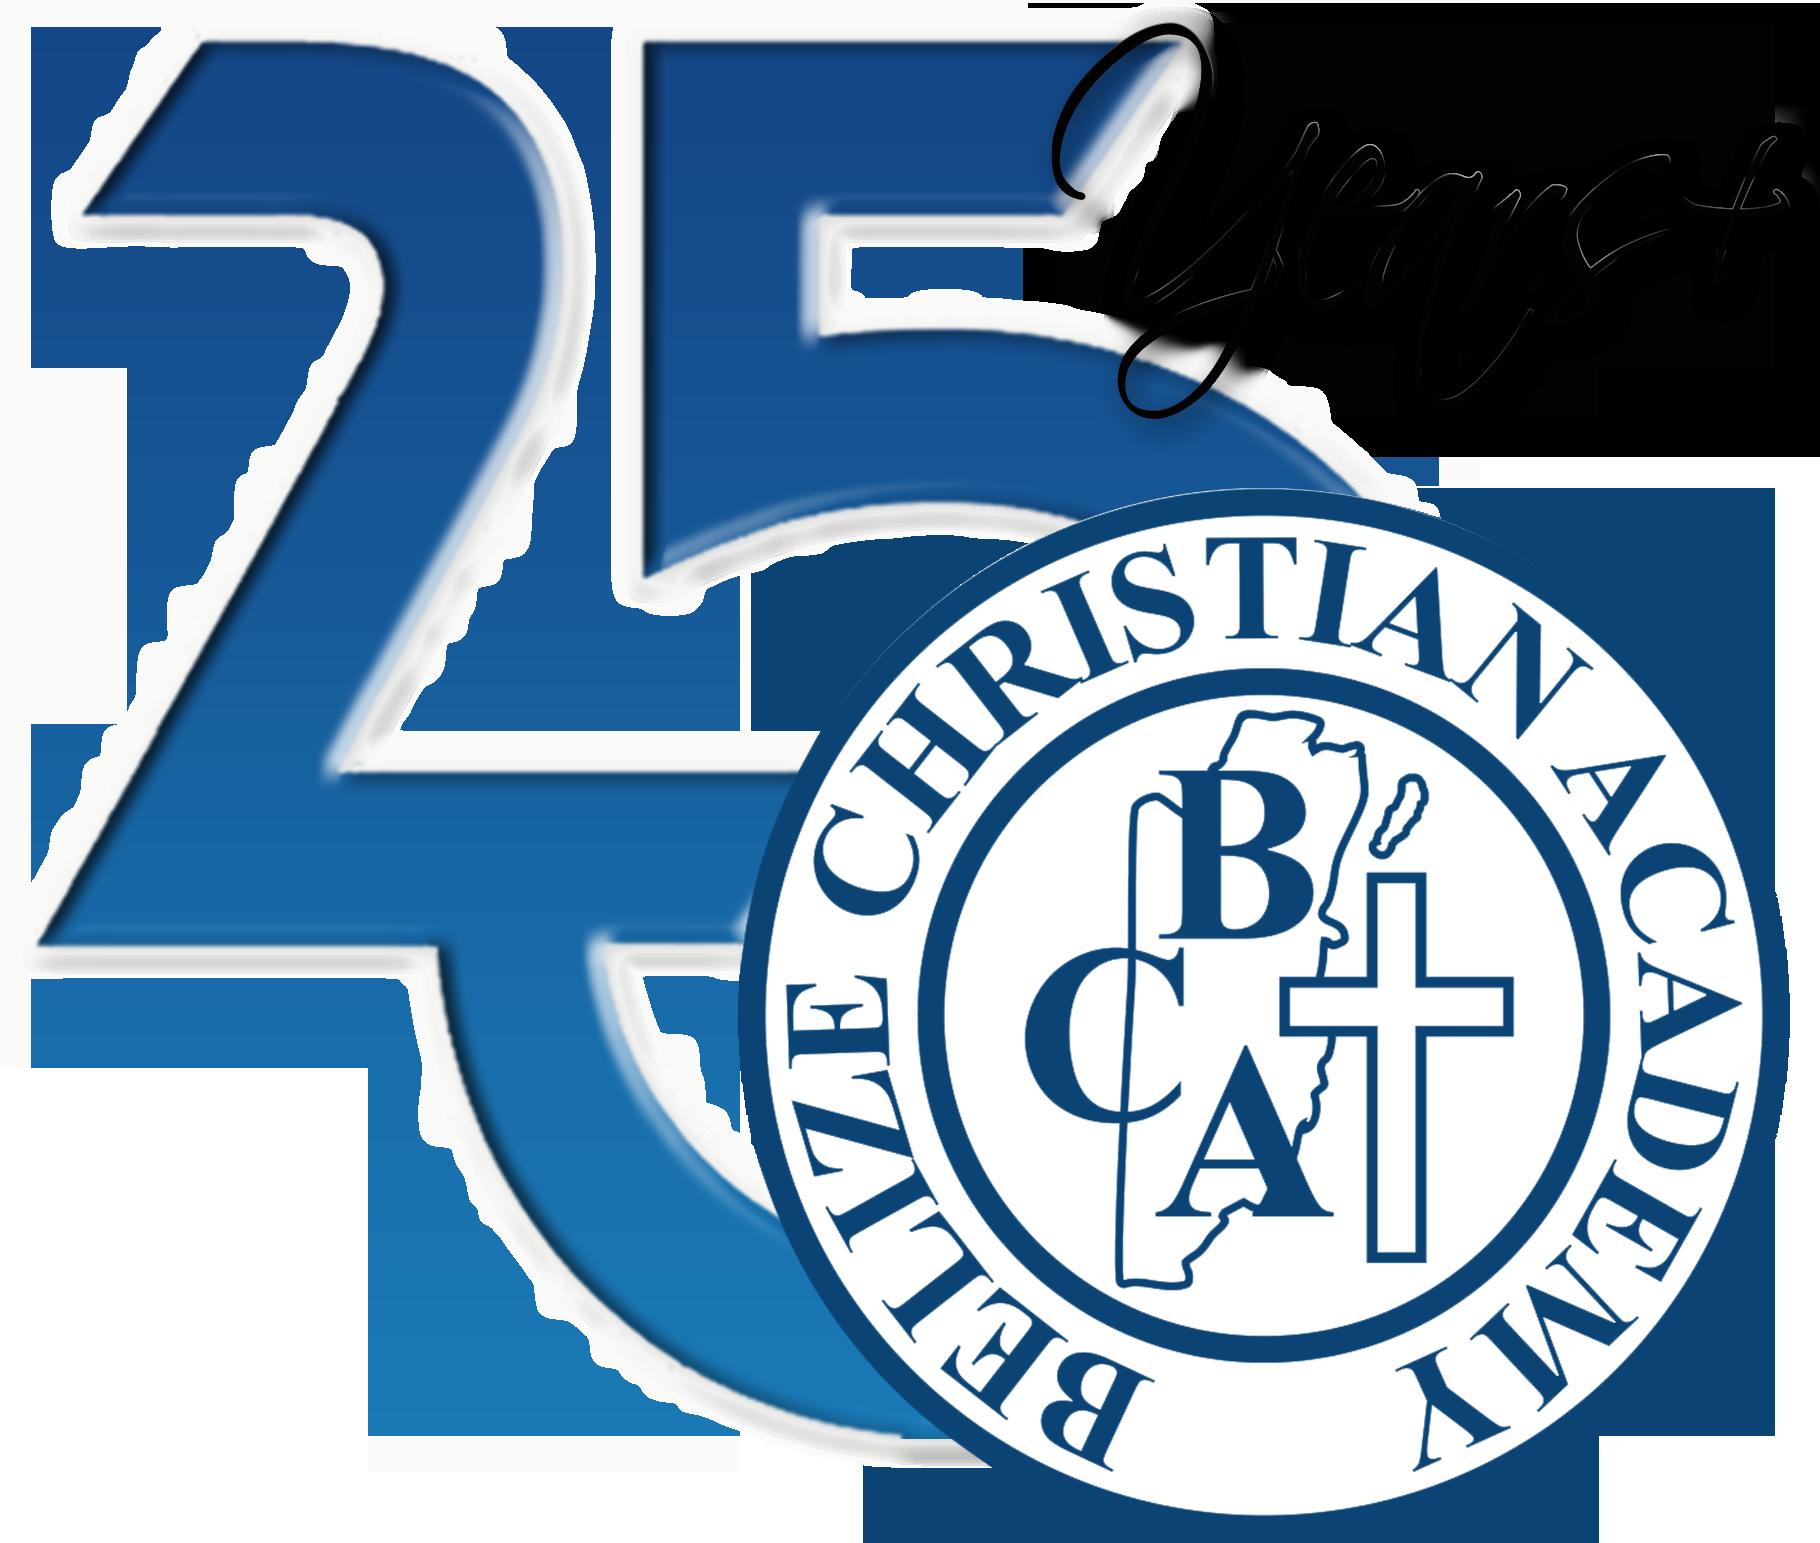 Belize Christian Academy